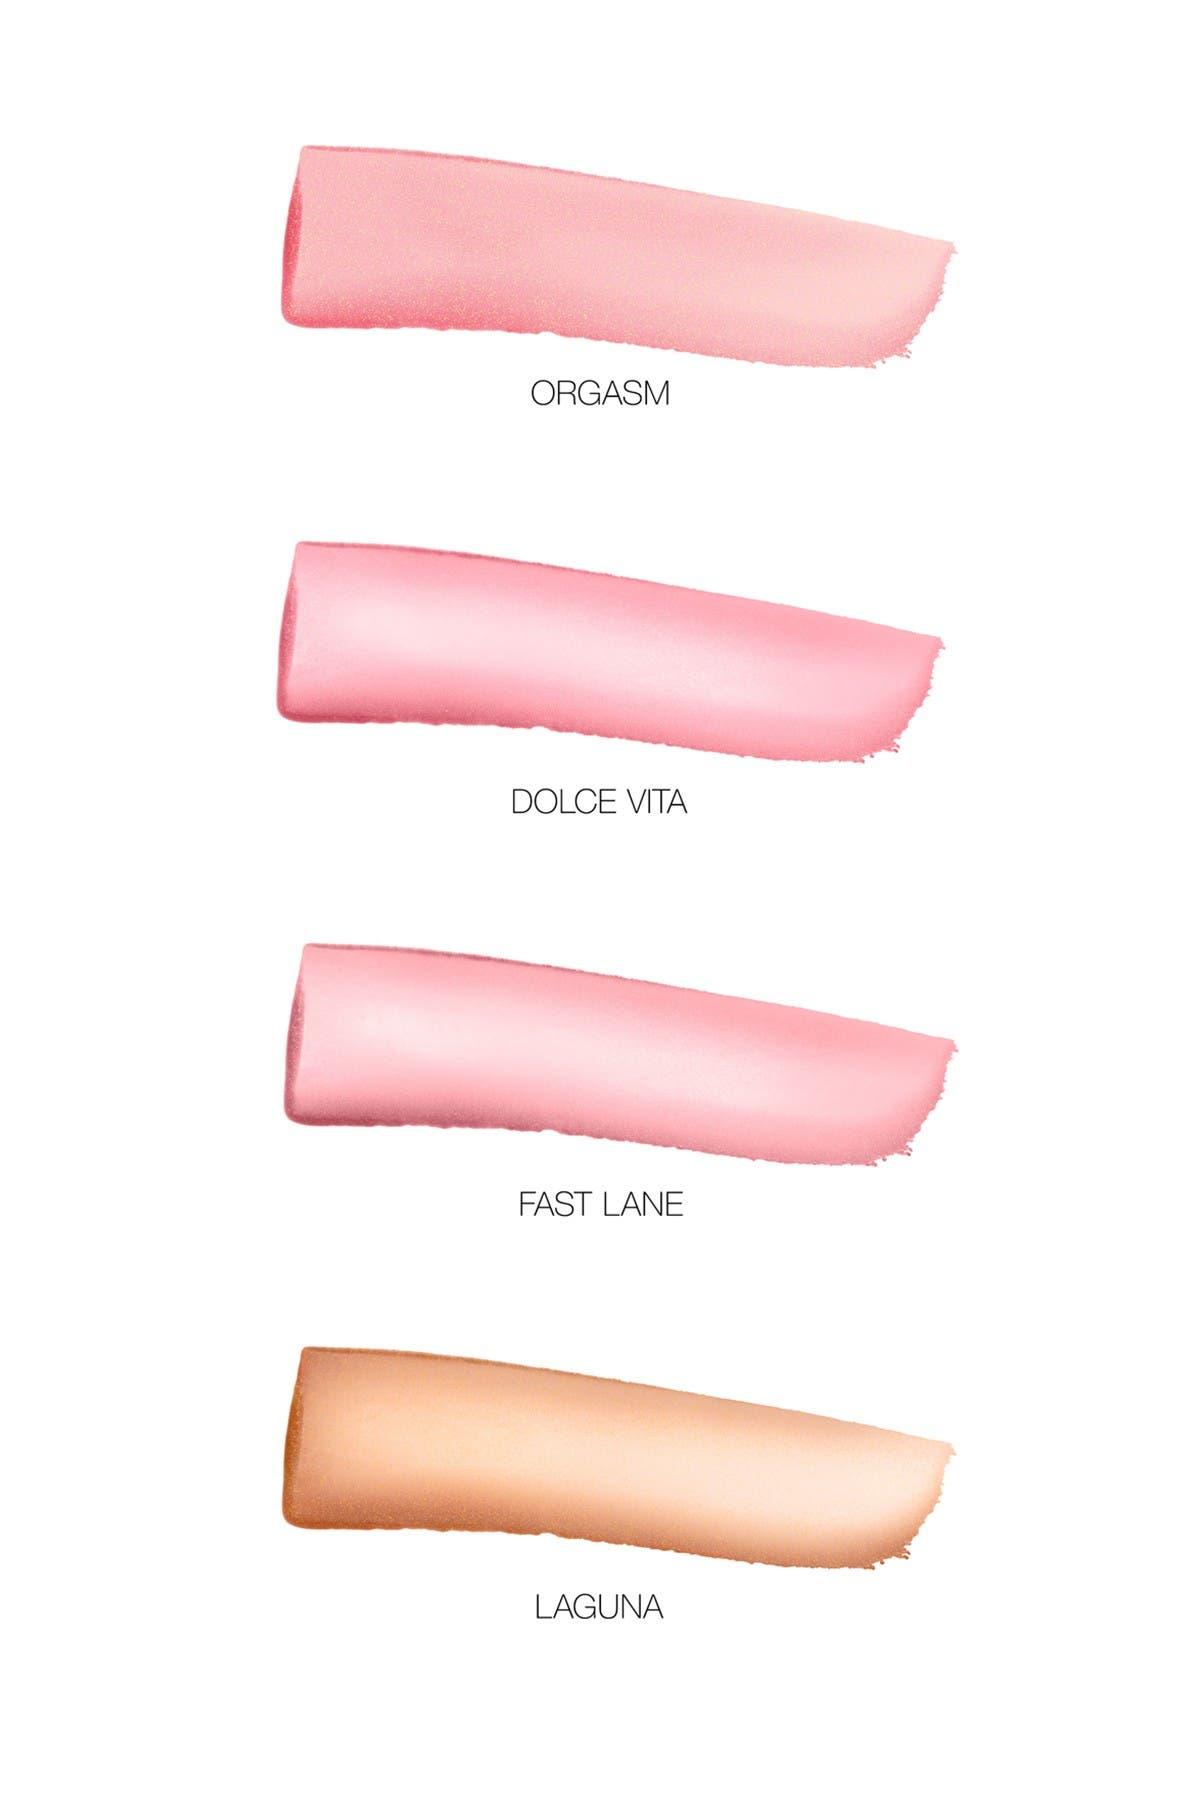 Image of NARS Undress Code Lip Balm Set